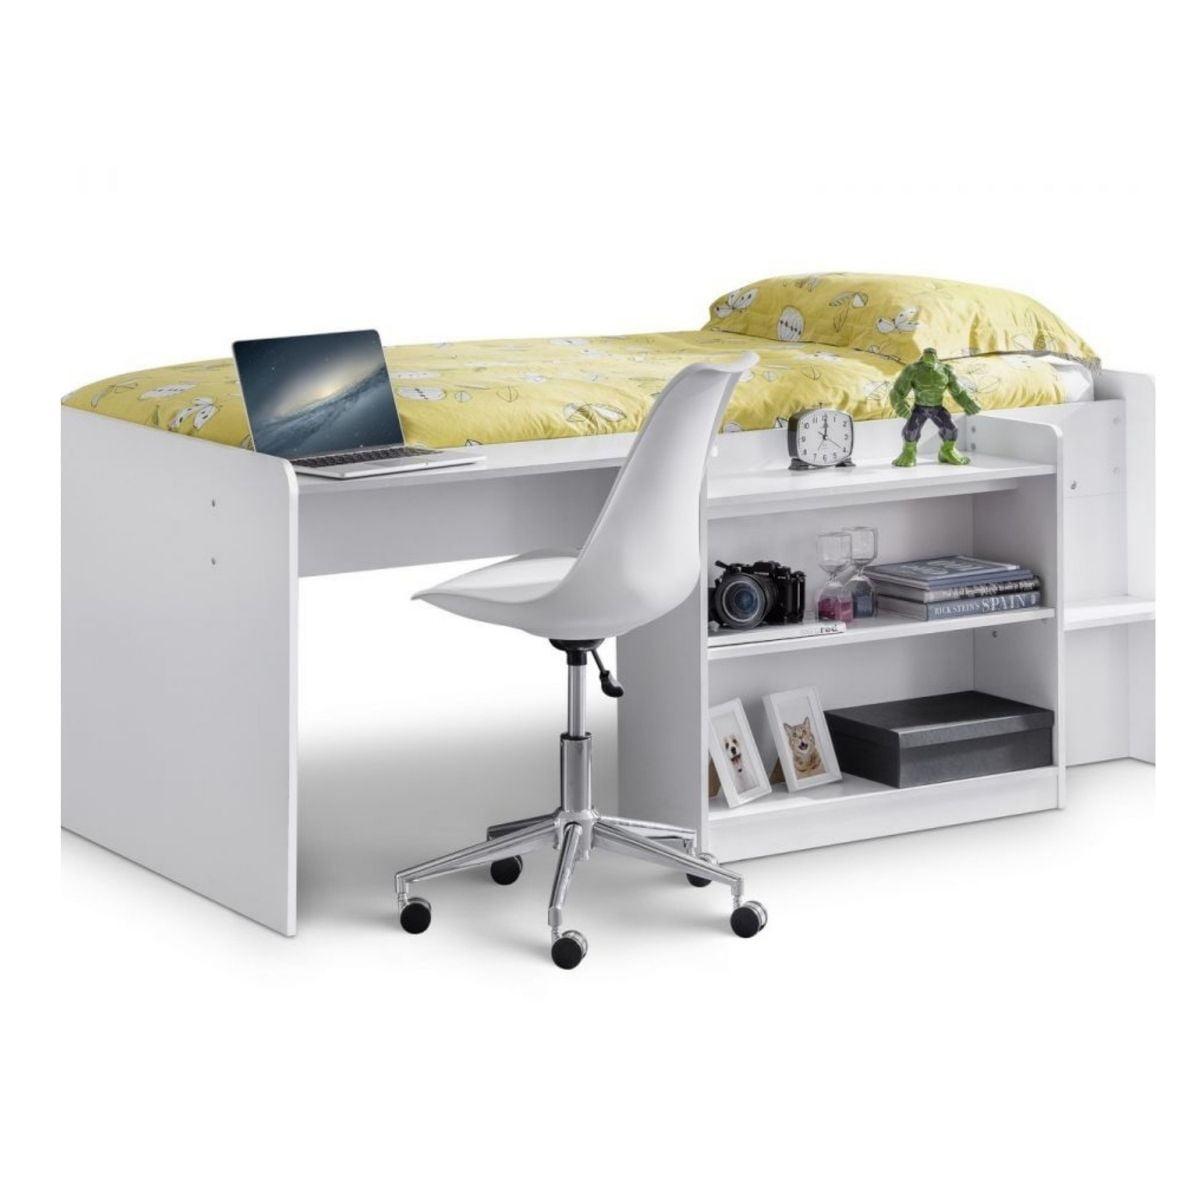 Noel Midsleeper Lofted Bed & Desk Set